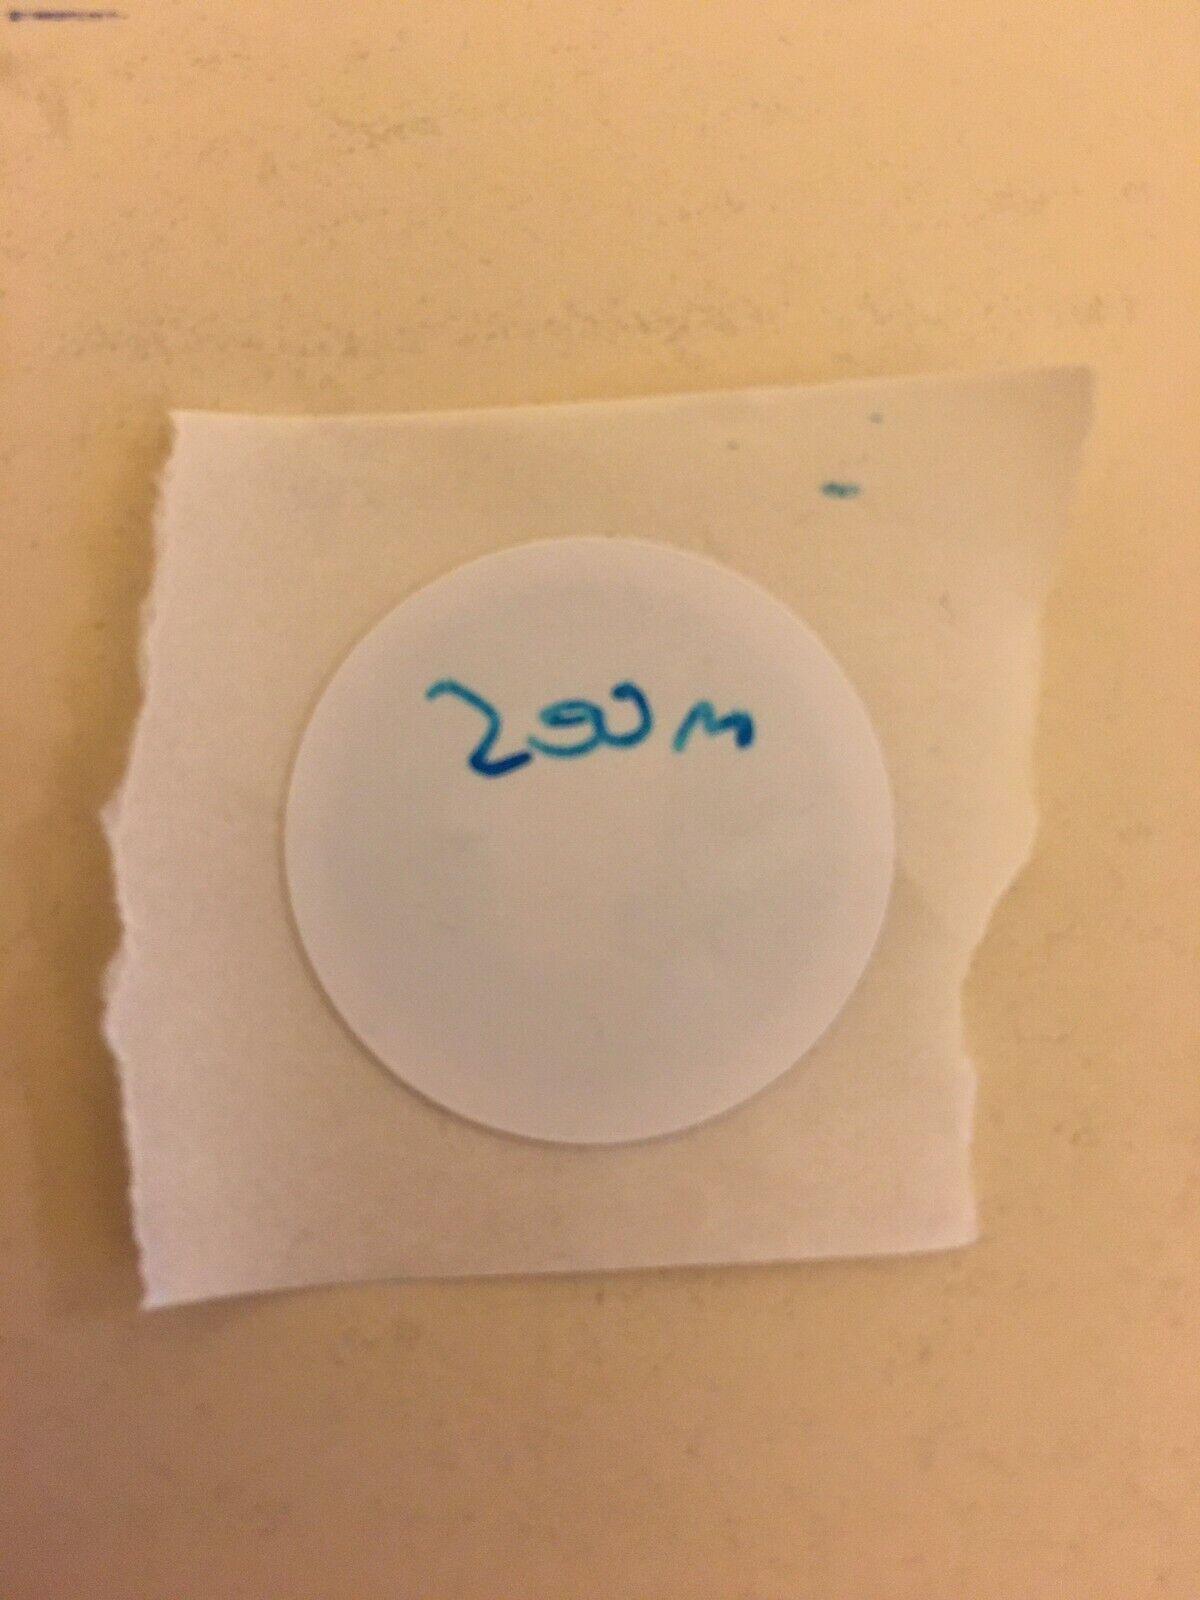 XYZ DA VINCI JR and Da Vinci mini NFC Chip PRE-PROGRAMMED FOR 200M Only